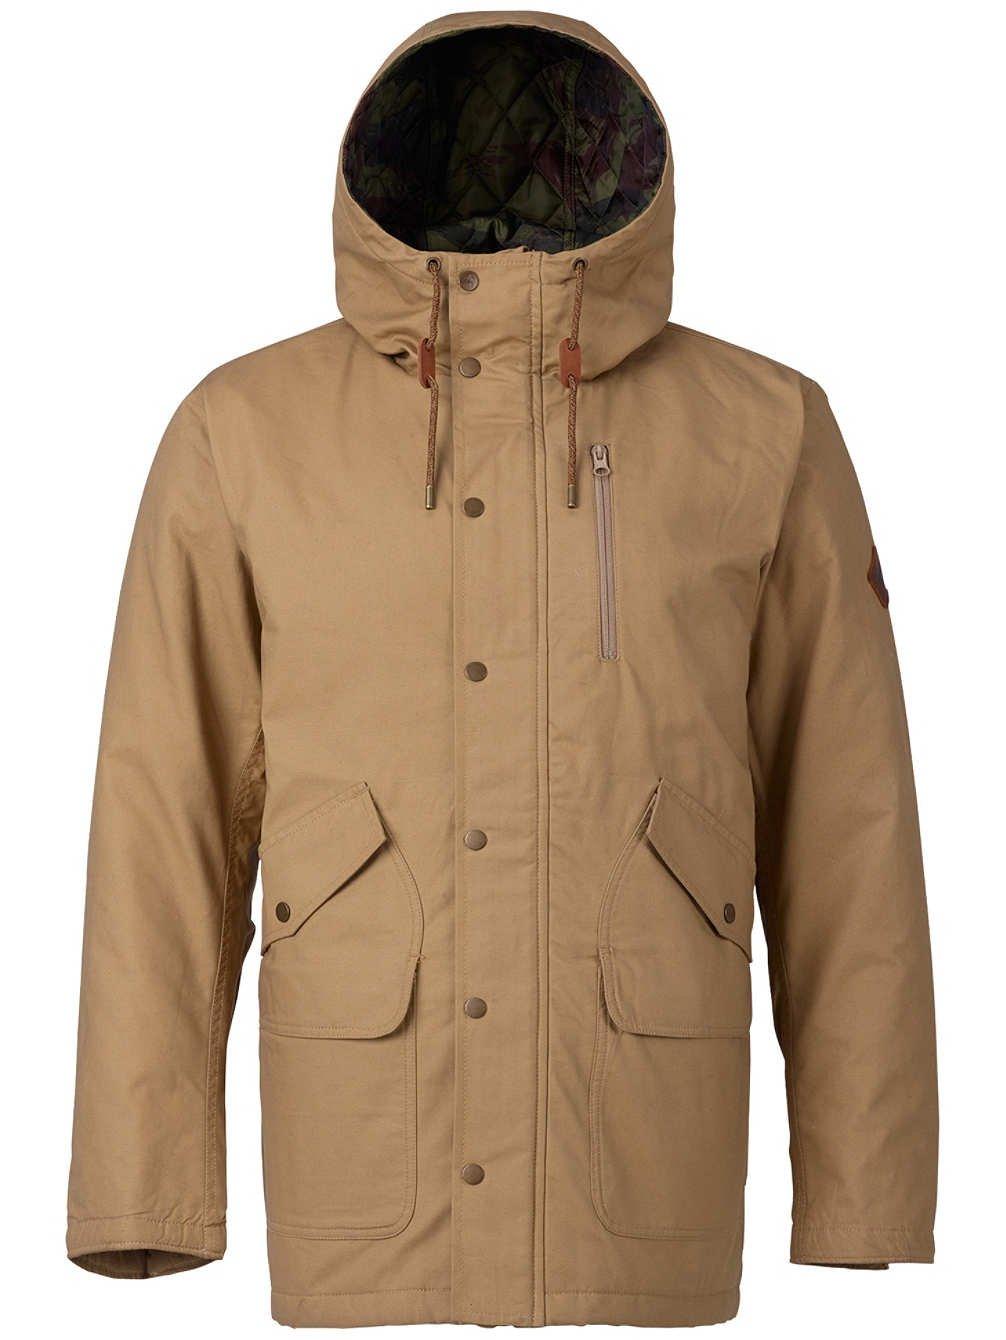 Amazon.com : Burton Mens Sherman Water Resistant Jacket ...